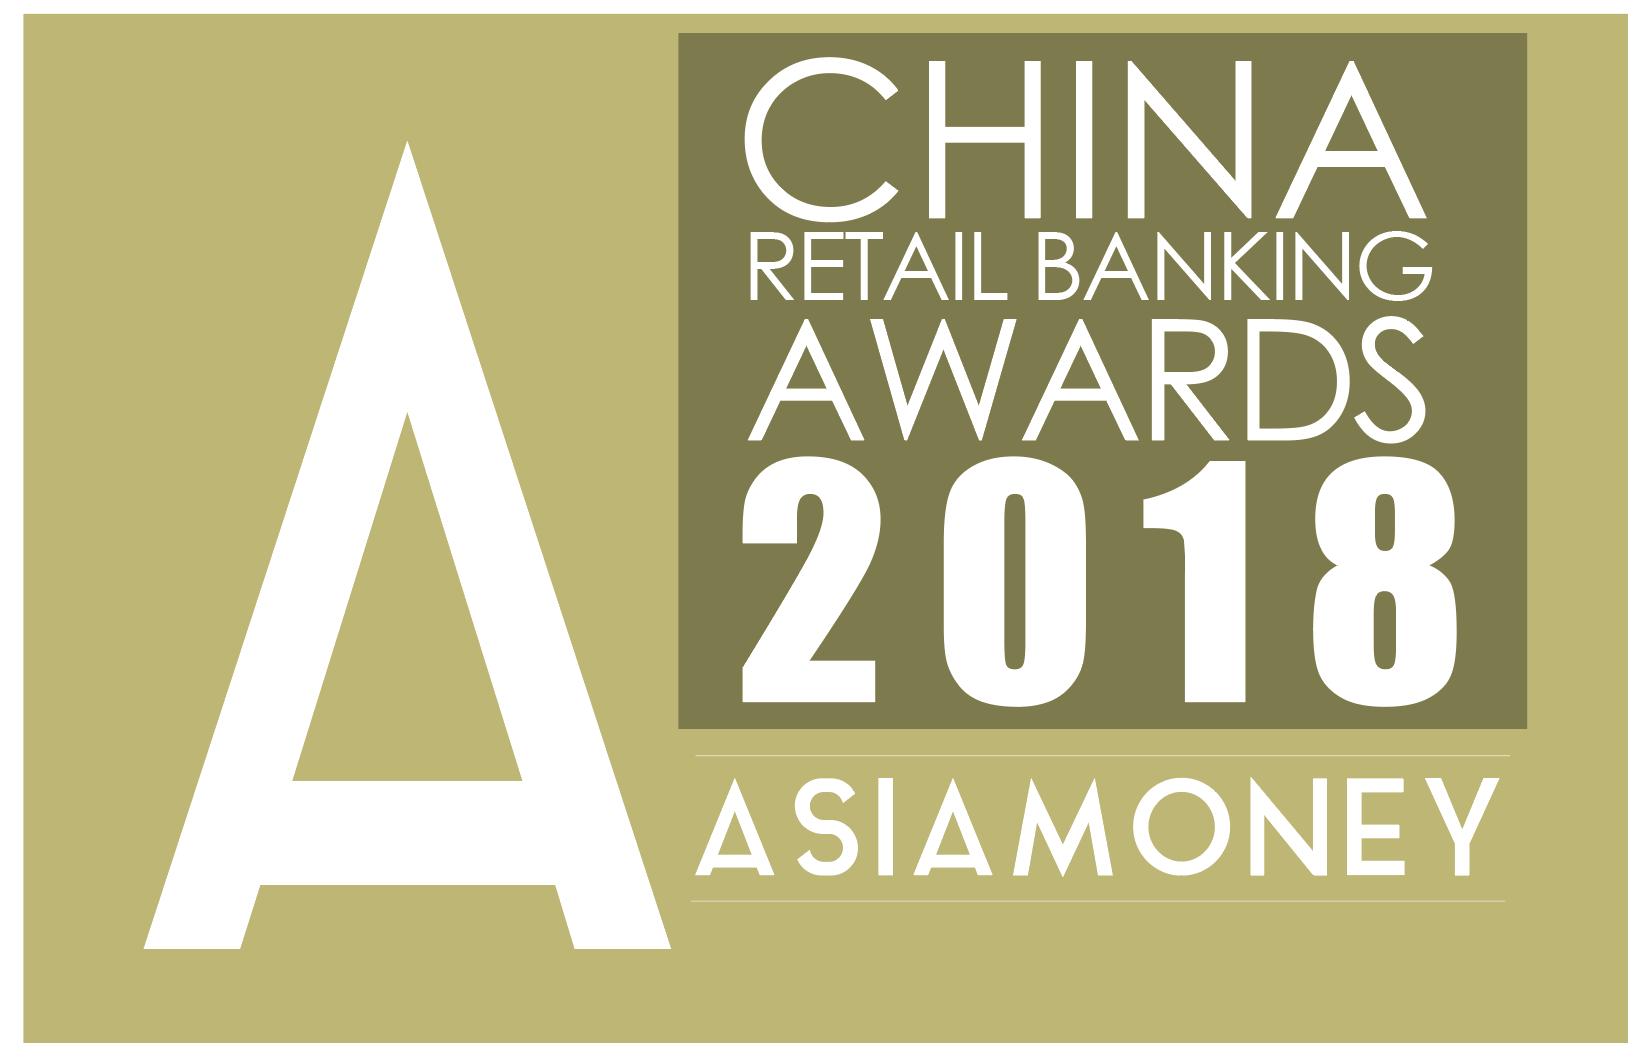 China retail awards